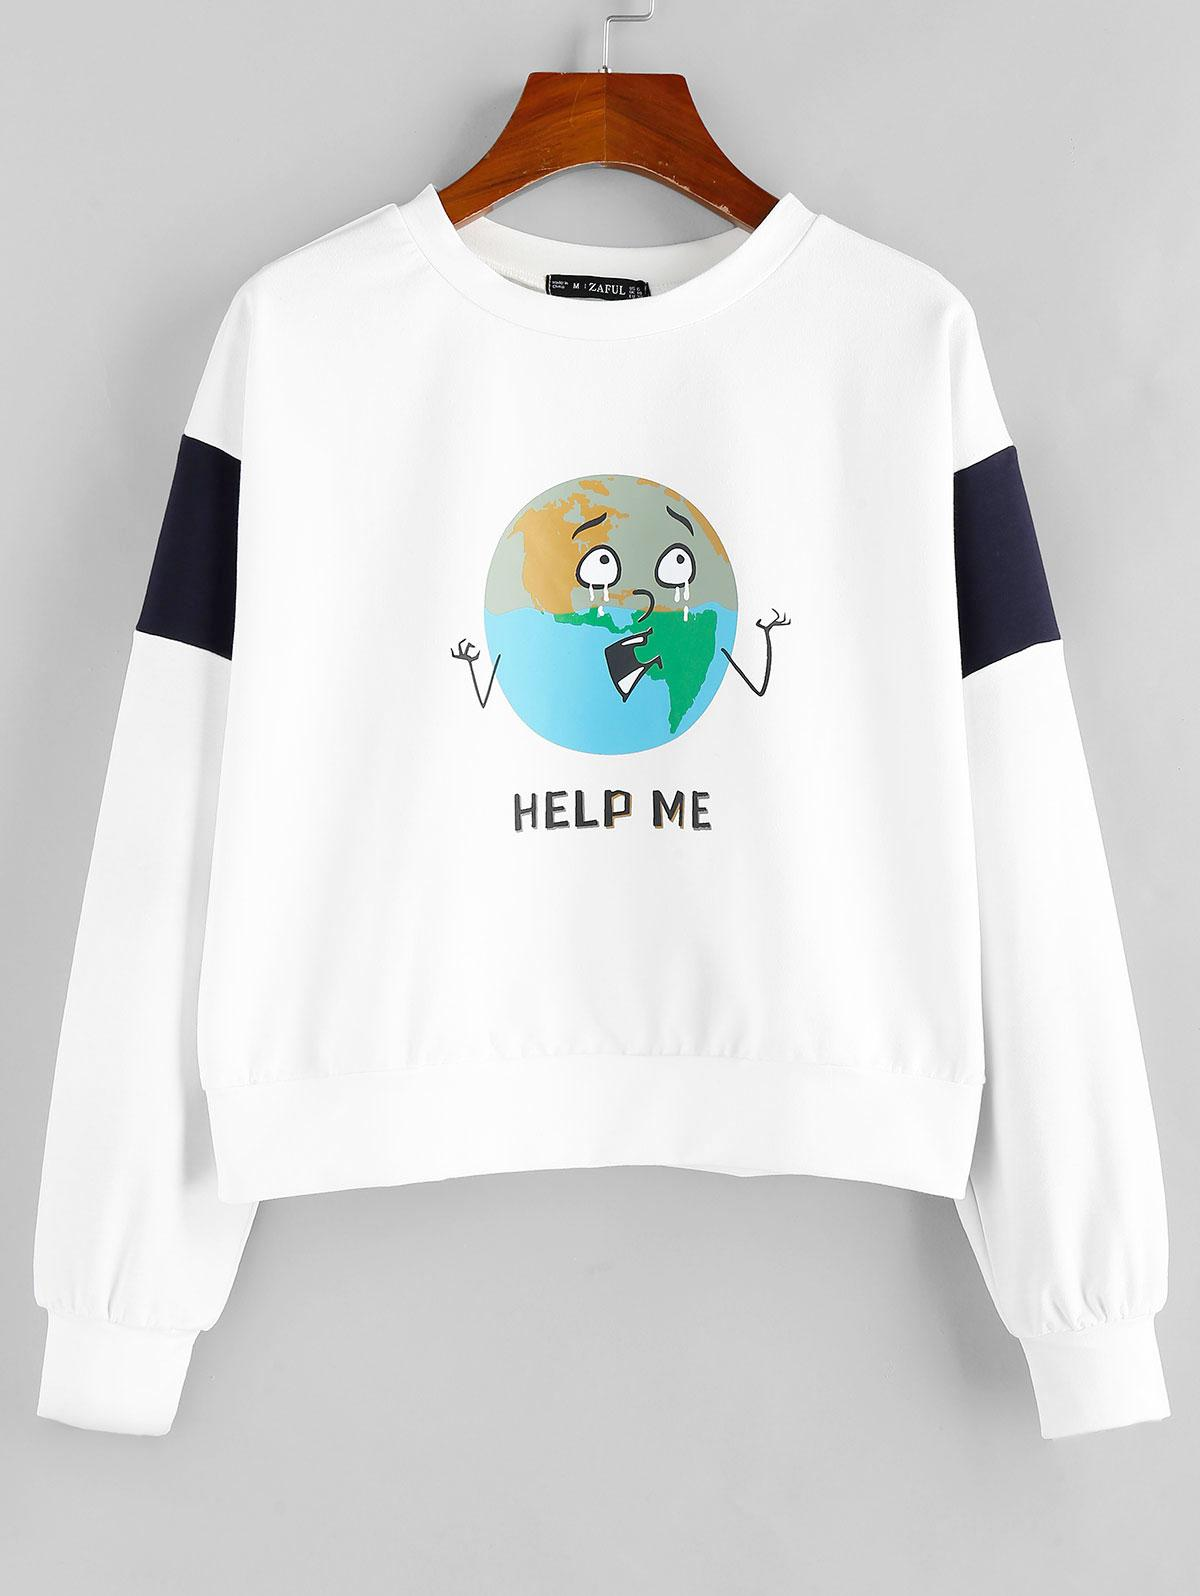 ZAFUL HELP ME Graphic Sweatshirt